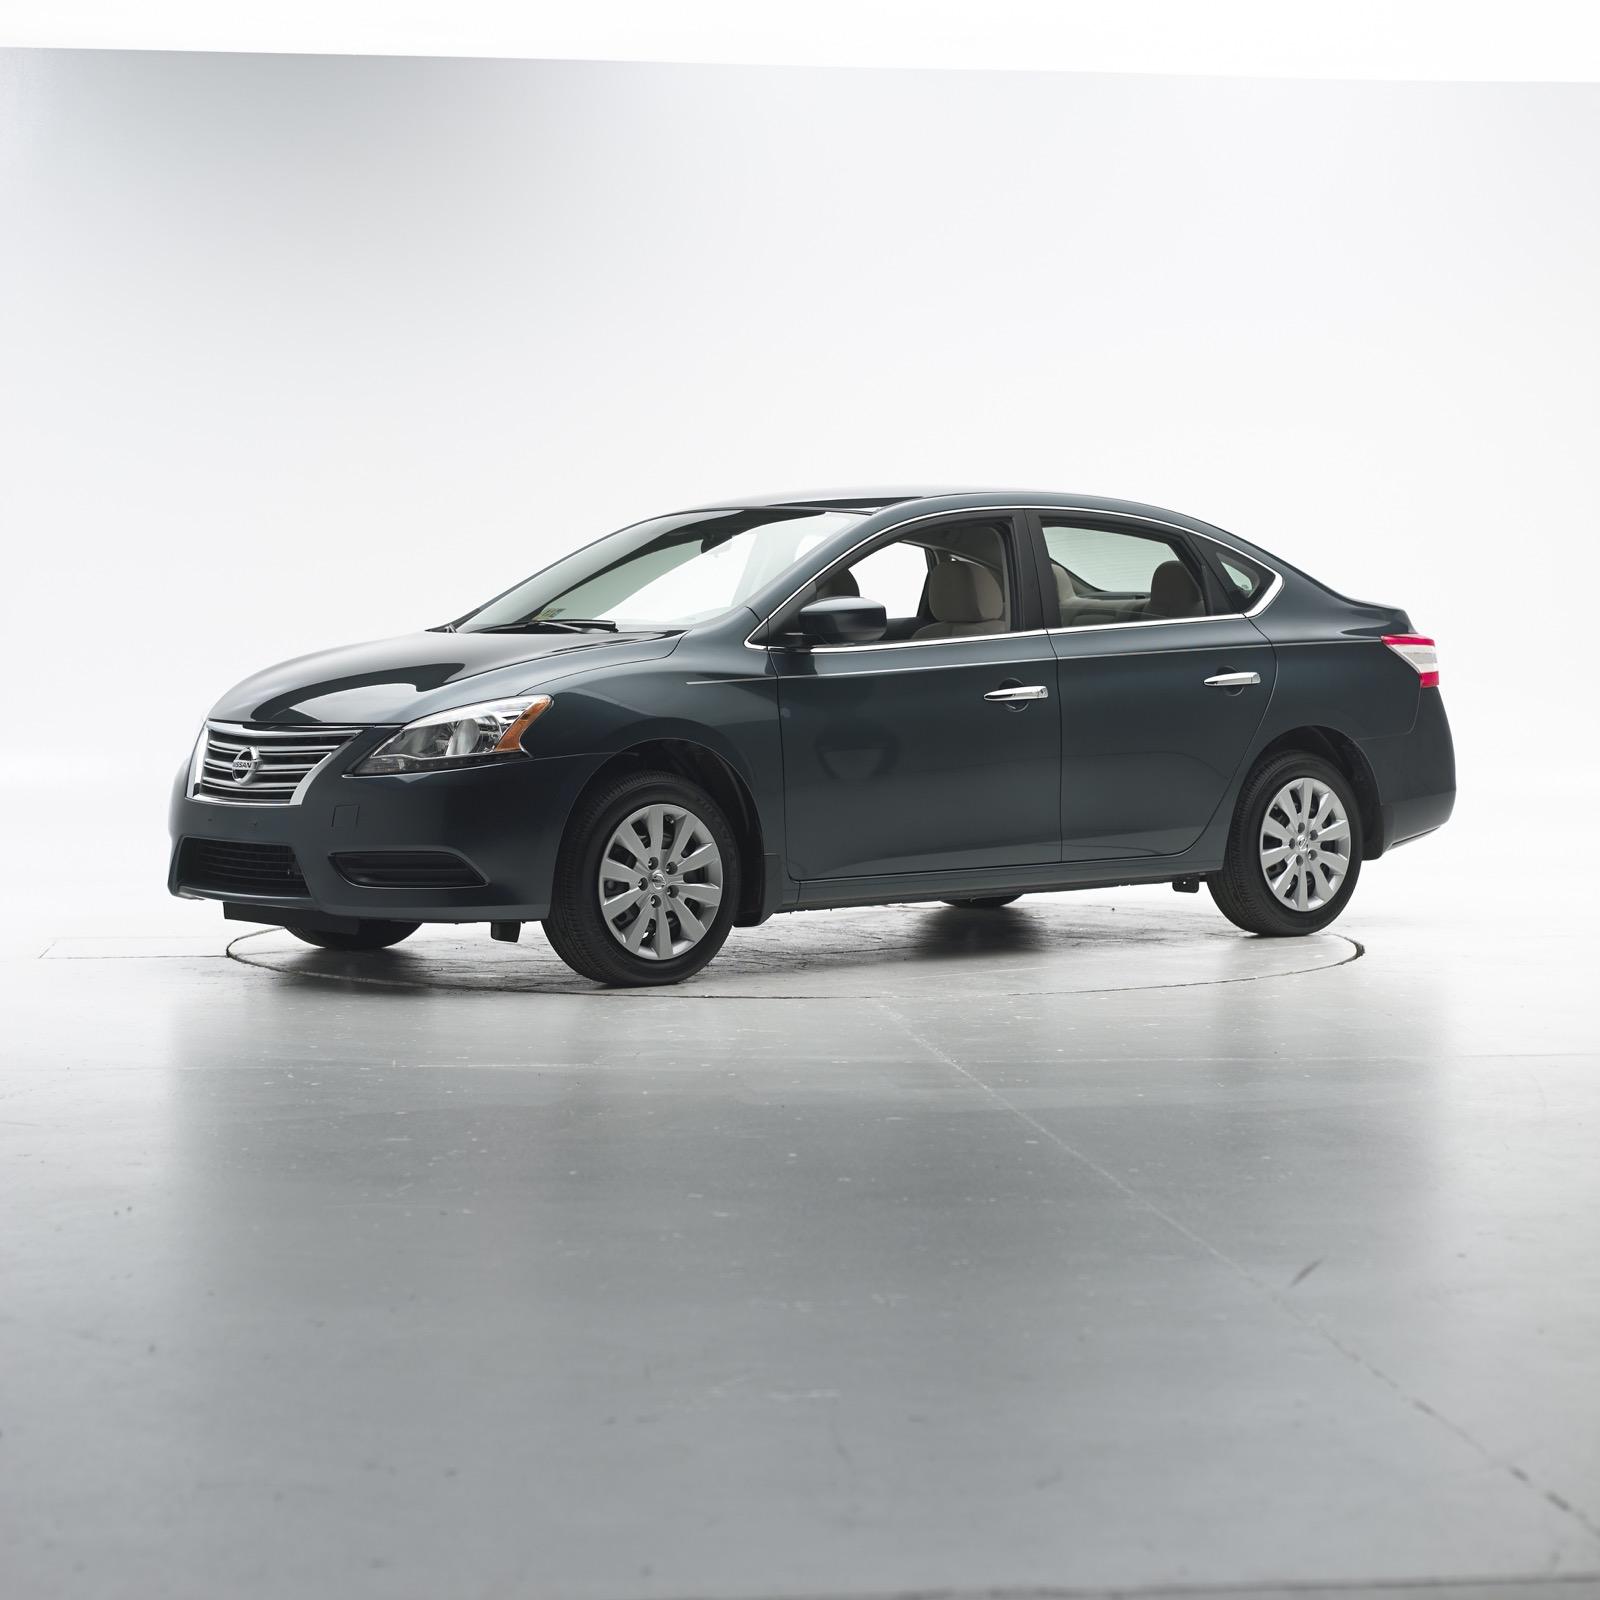 2014-2017 Nissan Leaf, Sentra Recalled Over Airbag Problems